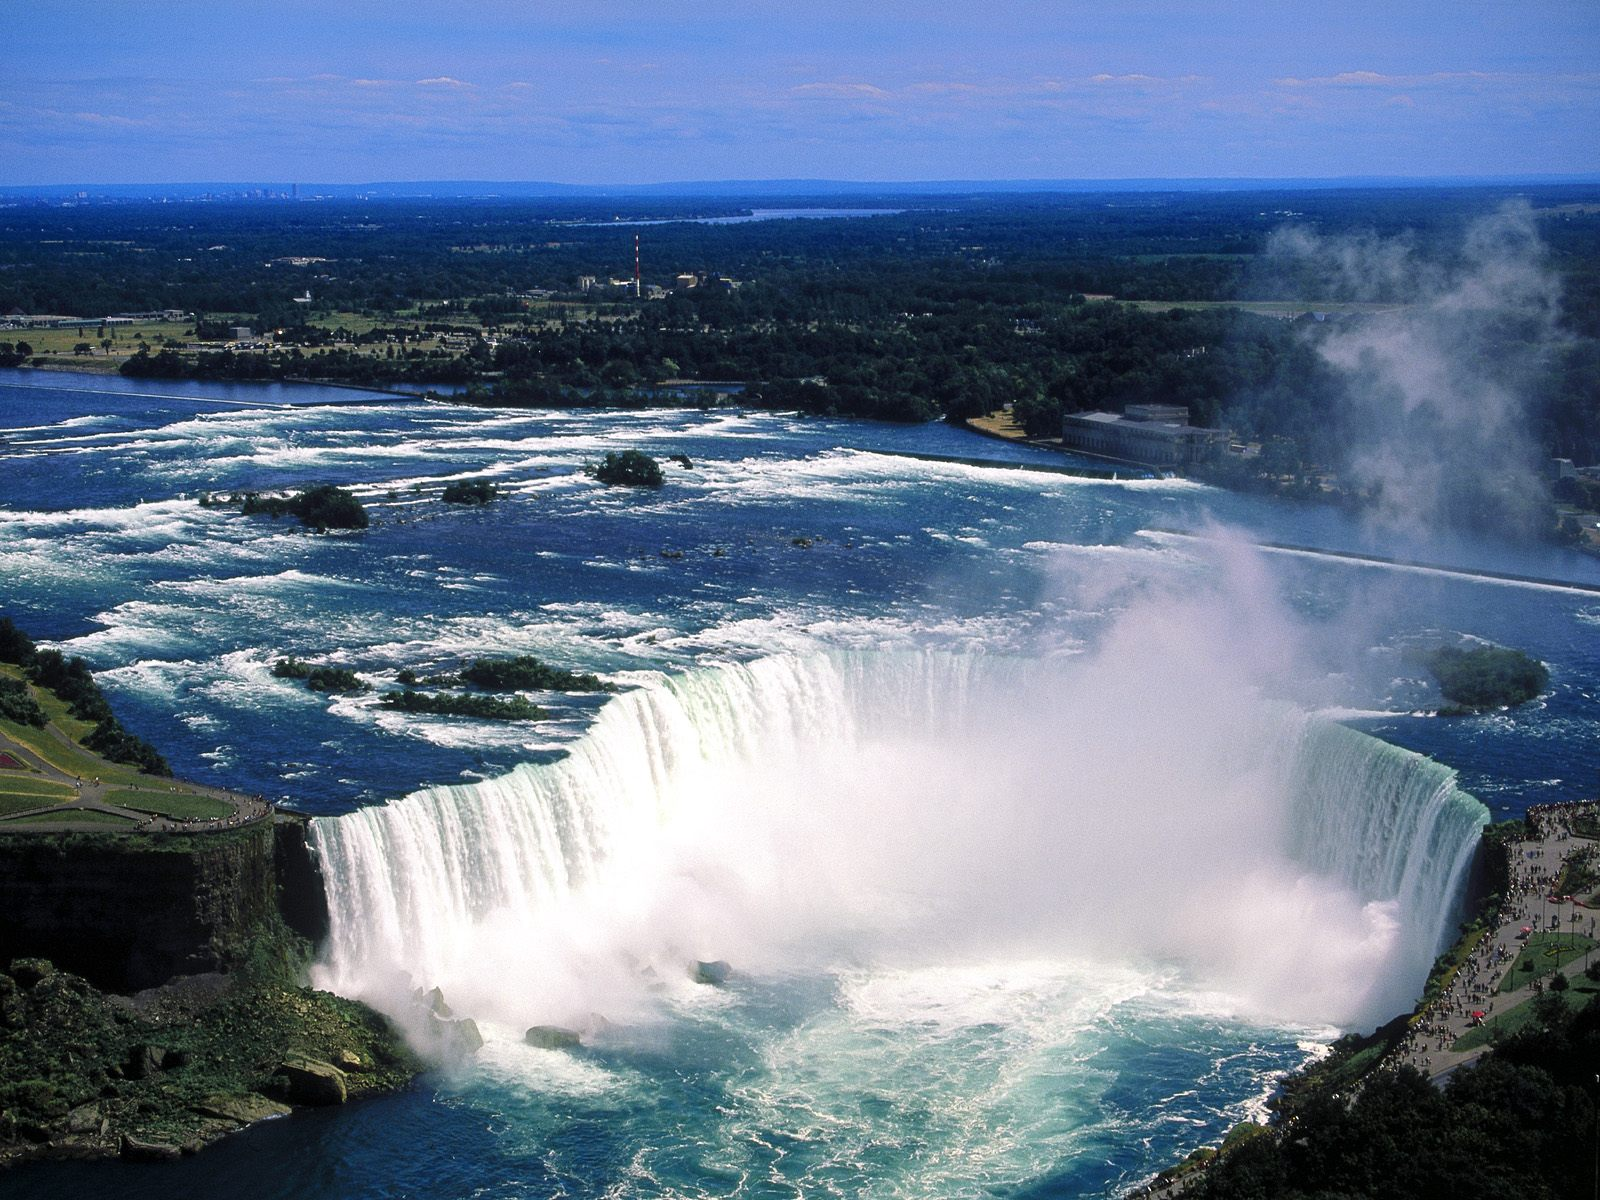 Louisville Independent Stanley Niagara Rd Escort Falls